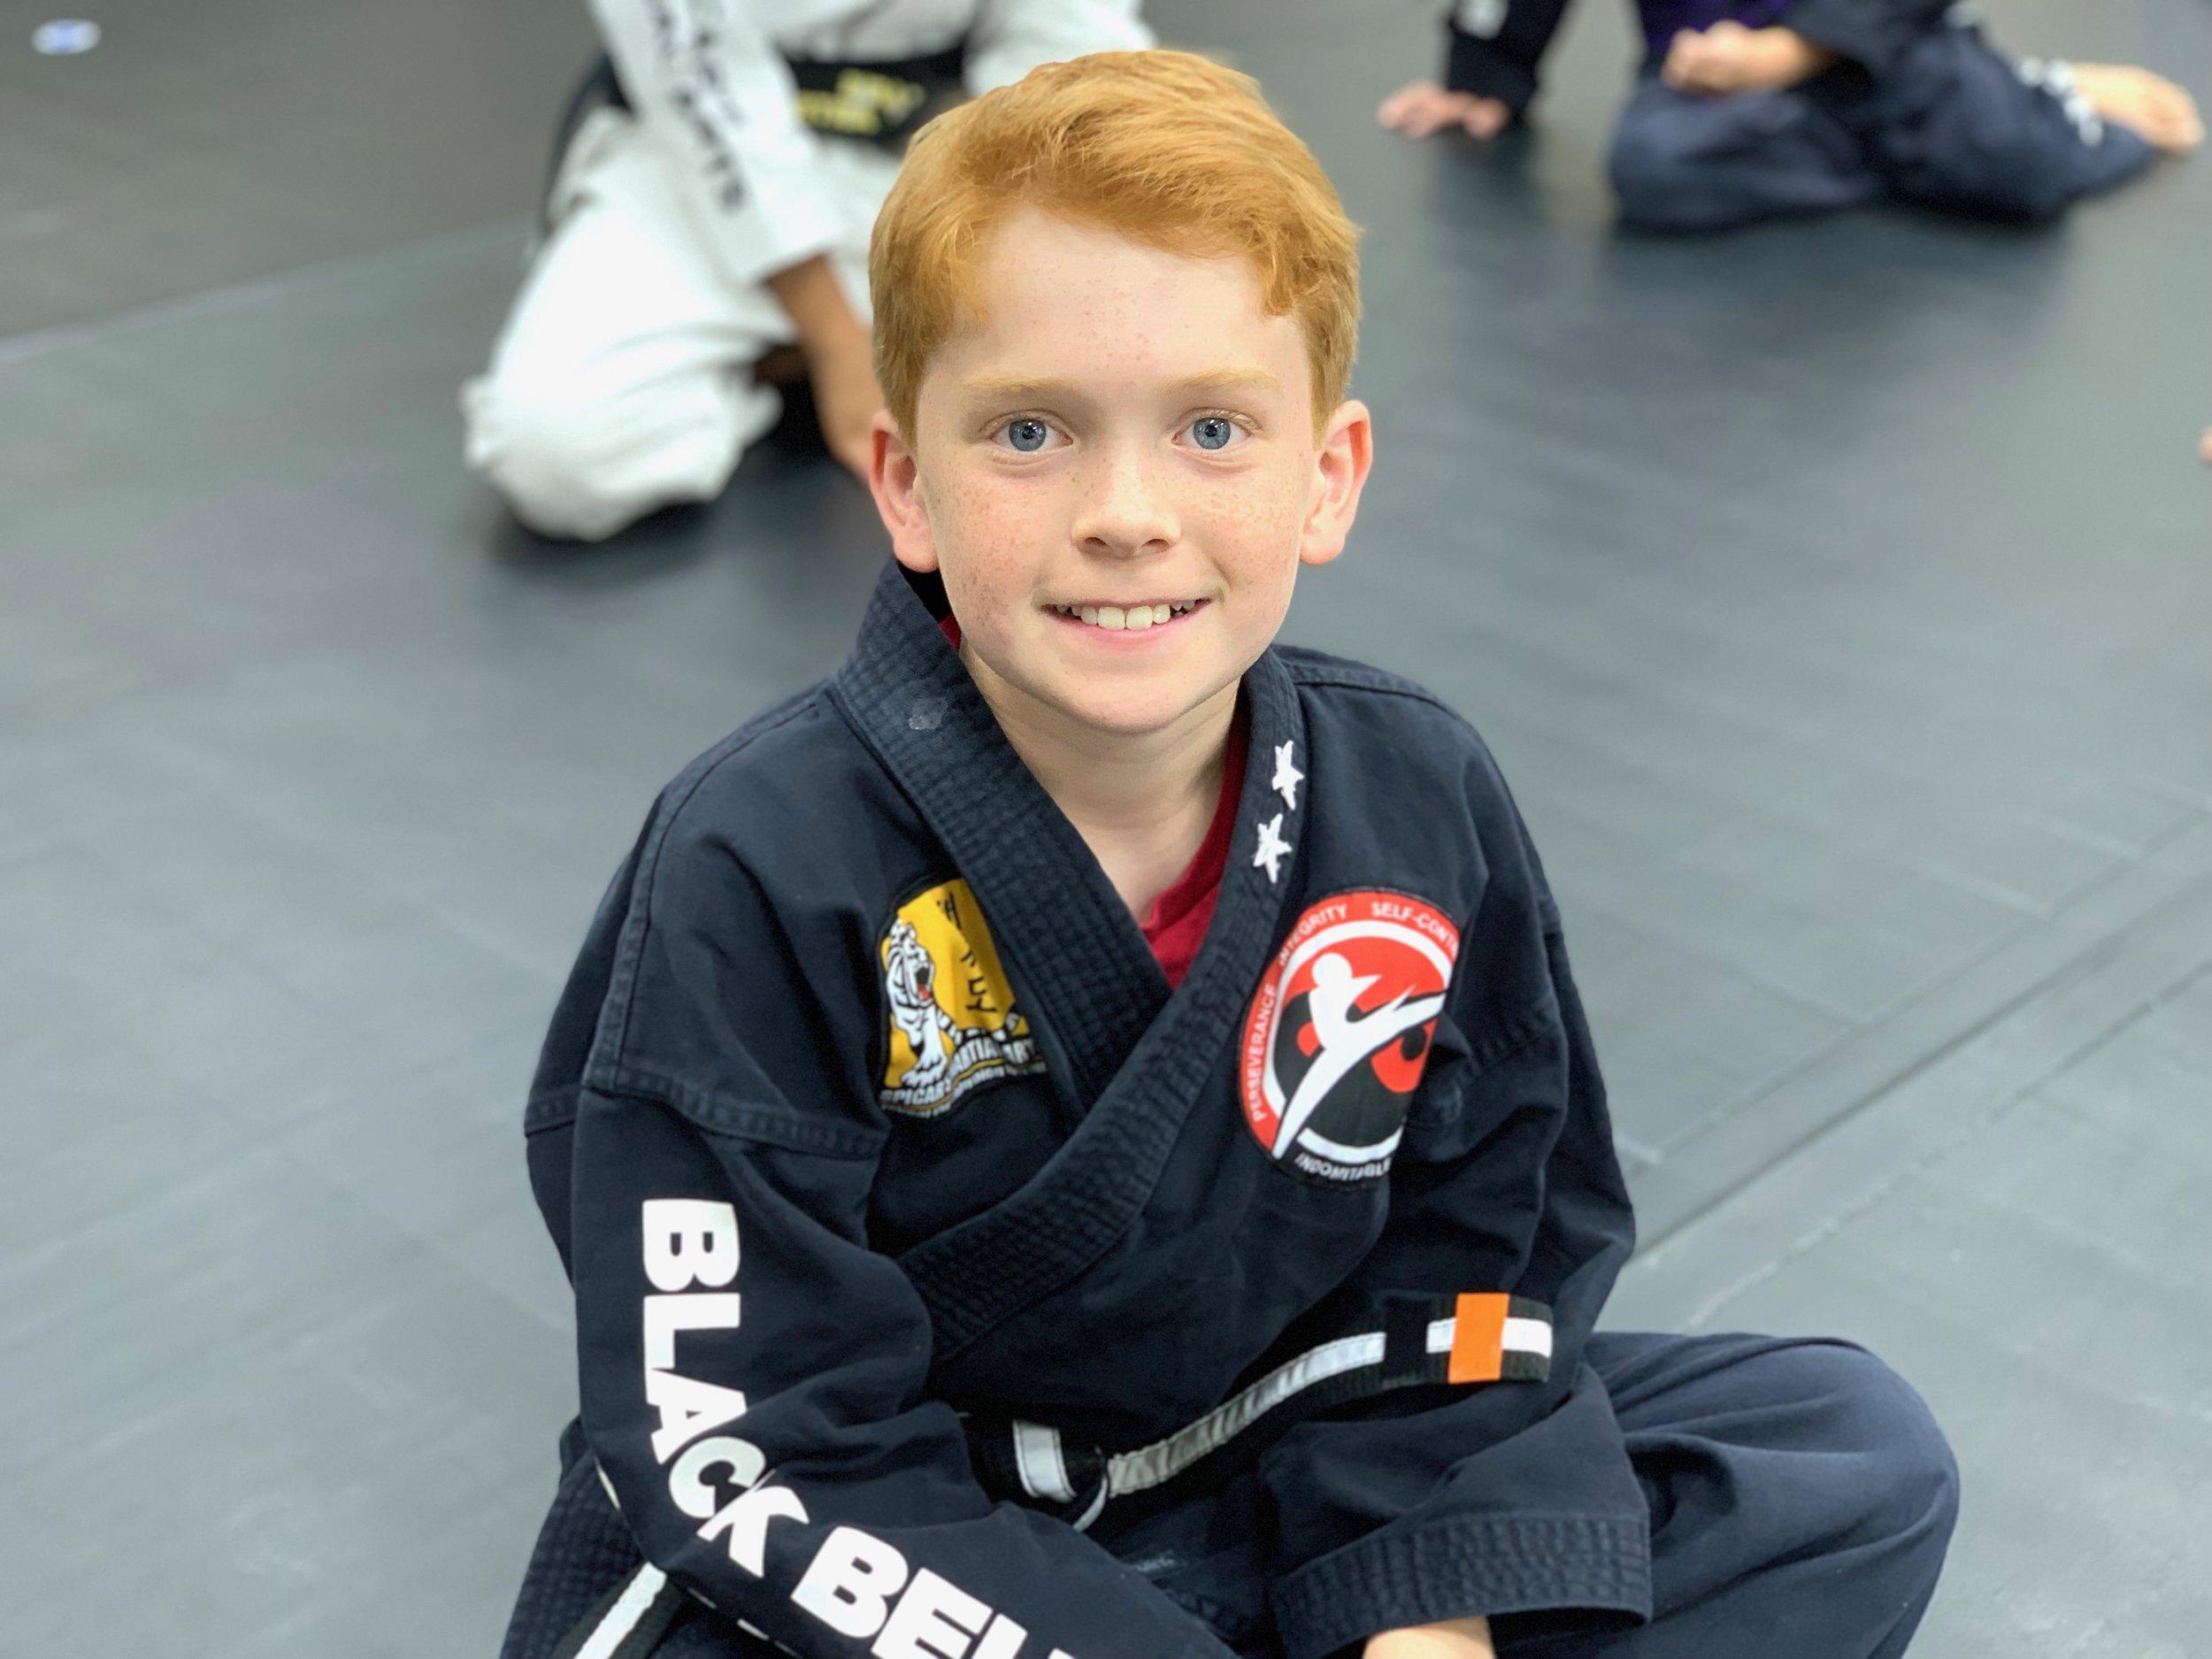 karate-kids-program-souhtlake-keller-grapevine-texas00019.jpeg